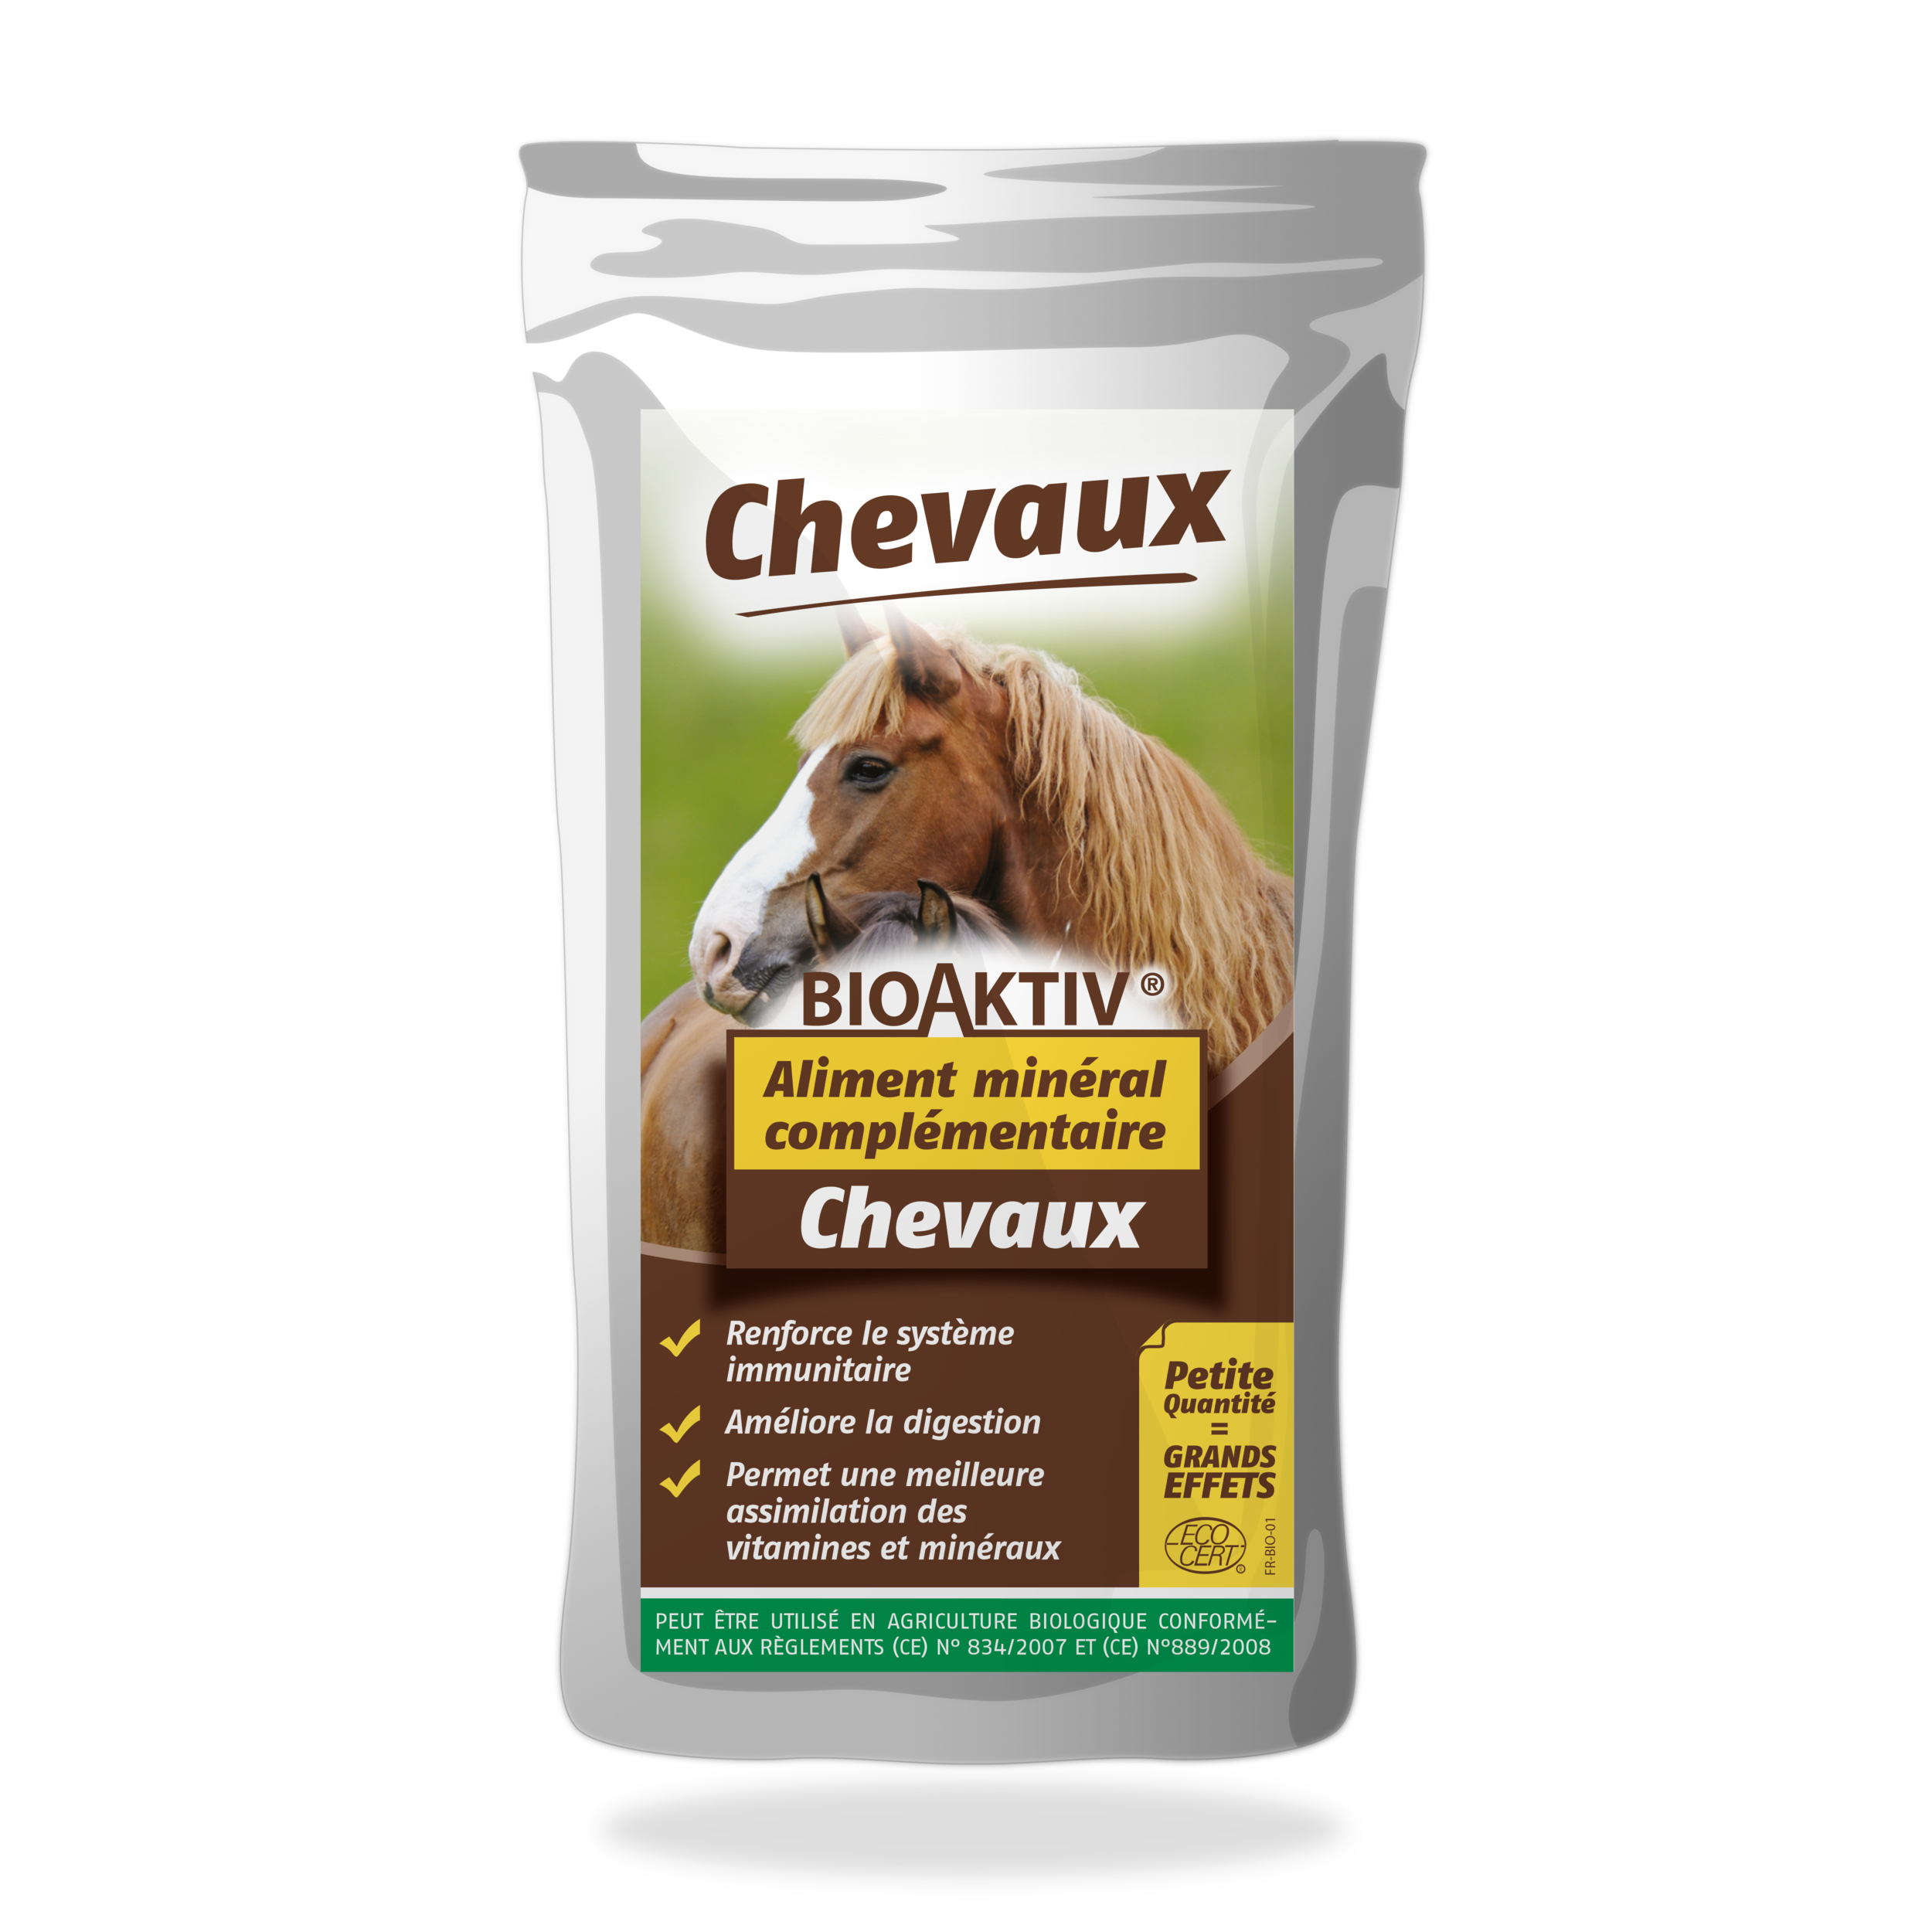 BioAktiv Chevaux